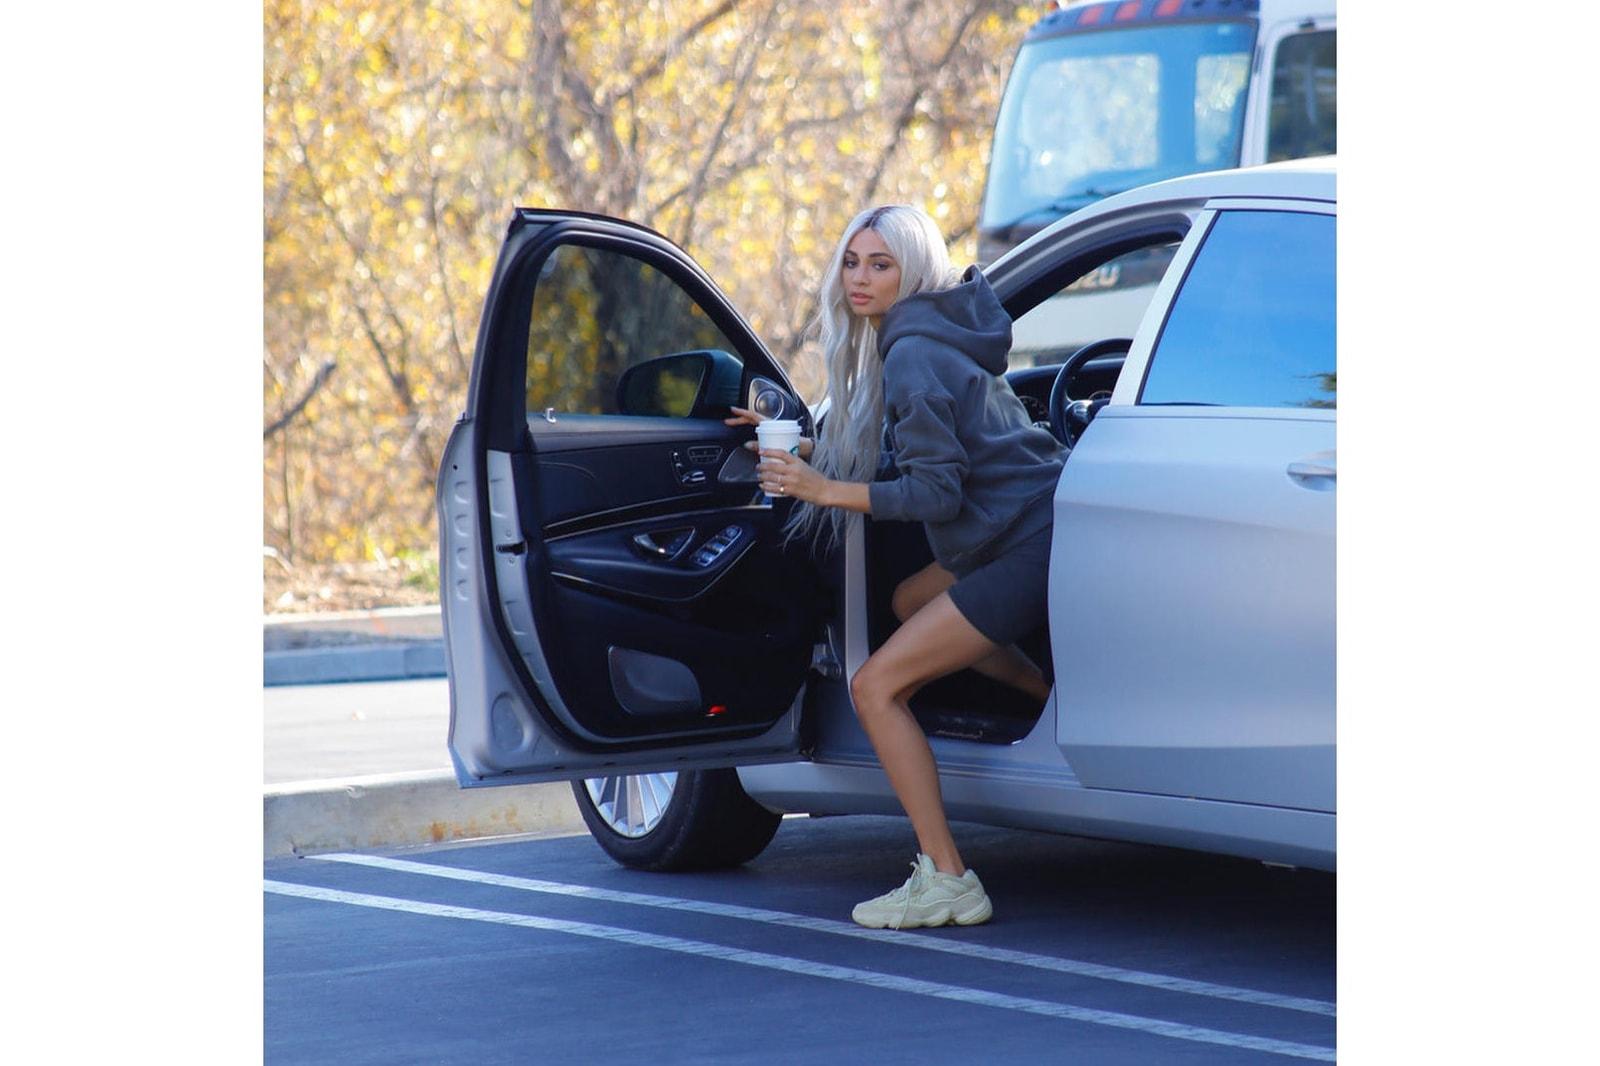 YEEZY Season 6 Kanye West Kim Kardashian Paris Hilton Instagram Balenciaga Spring Summer 2018 Campaign Demna Gvasalia Paparazzi Splash News Bestimage Fashion Ad